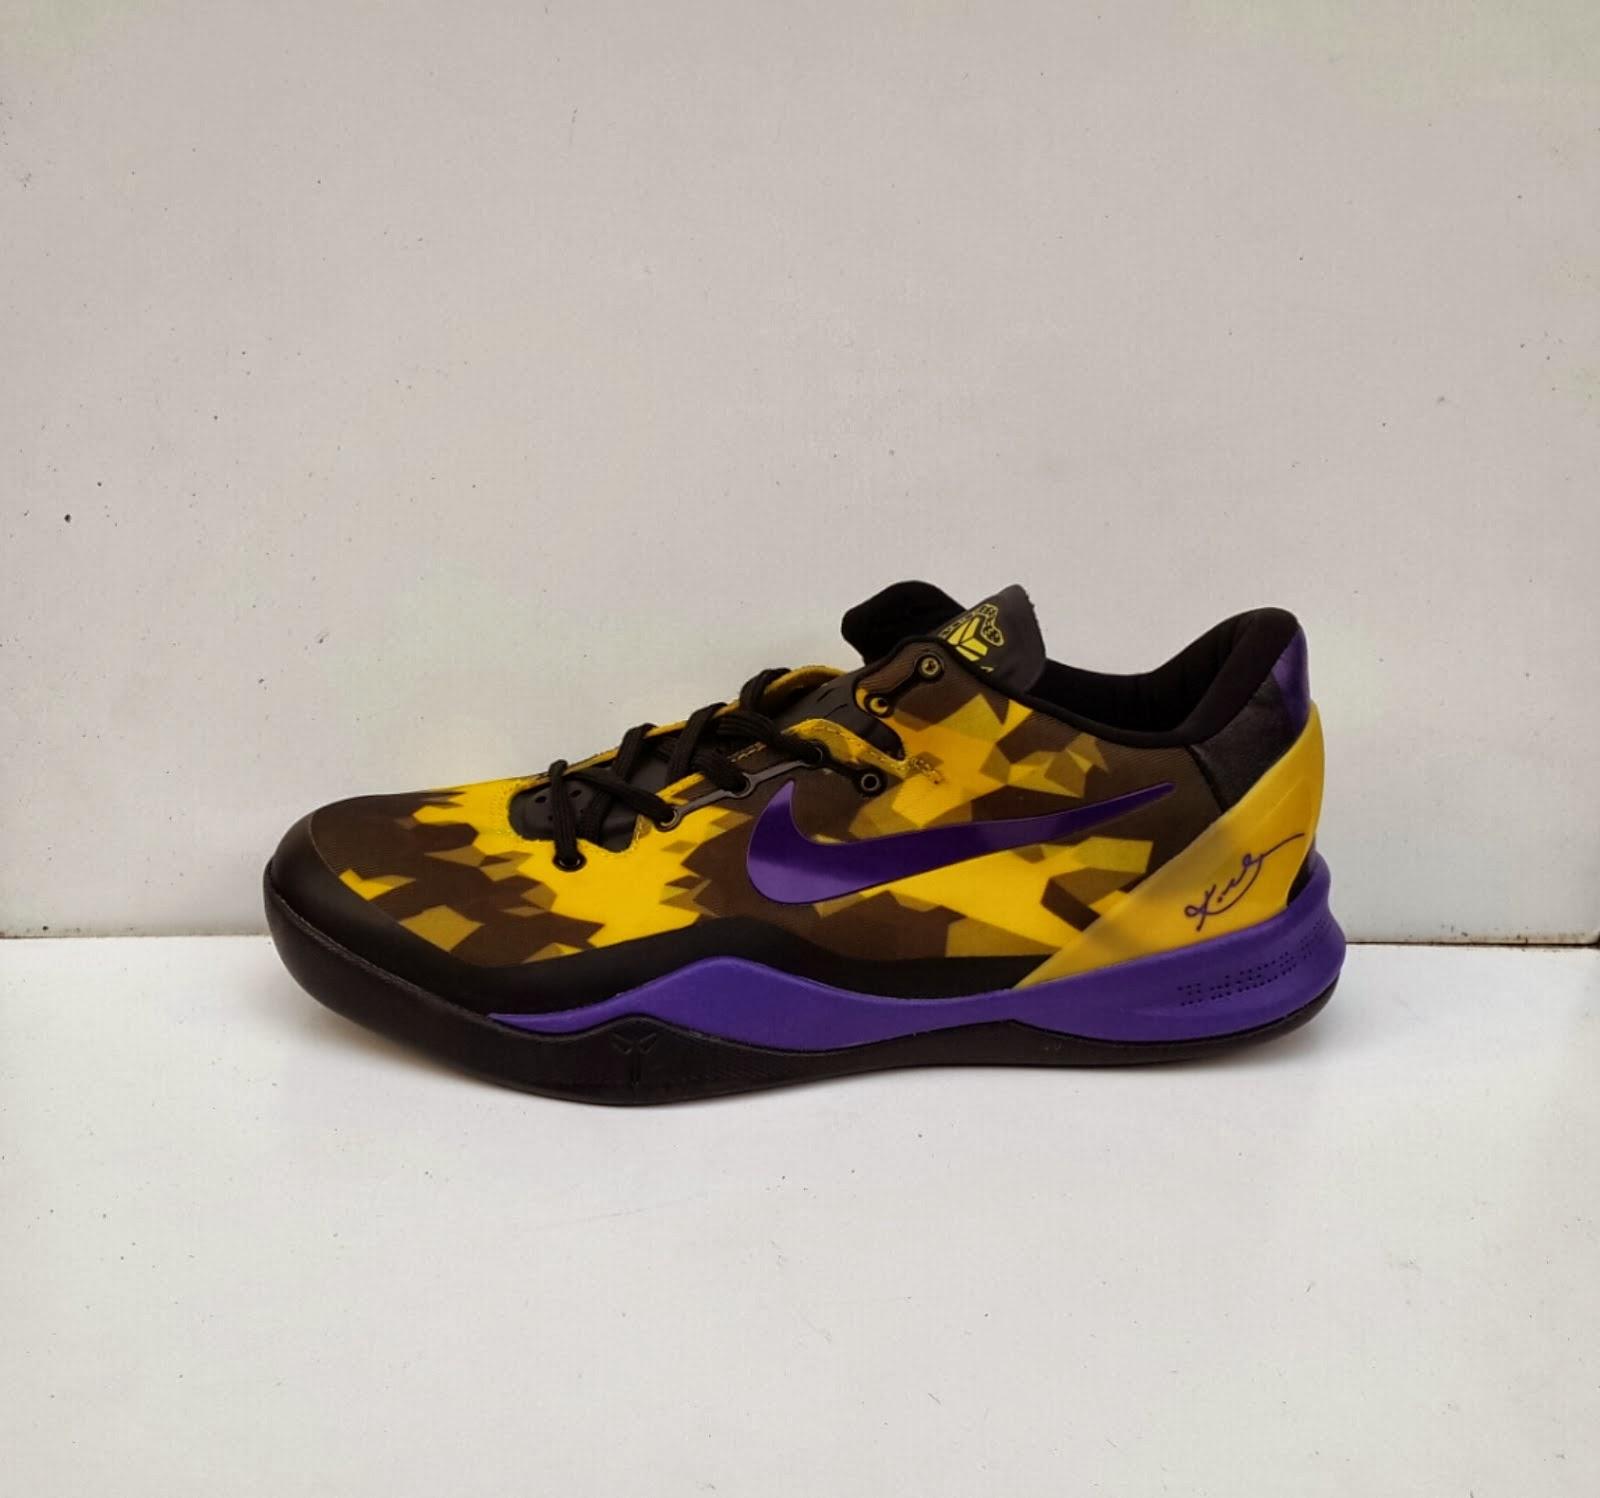 competitive price a81be 47175 Sepatu Nike Kobe 8 Grosir Sepatu Running sepatu murah Toko S ...